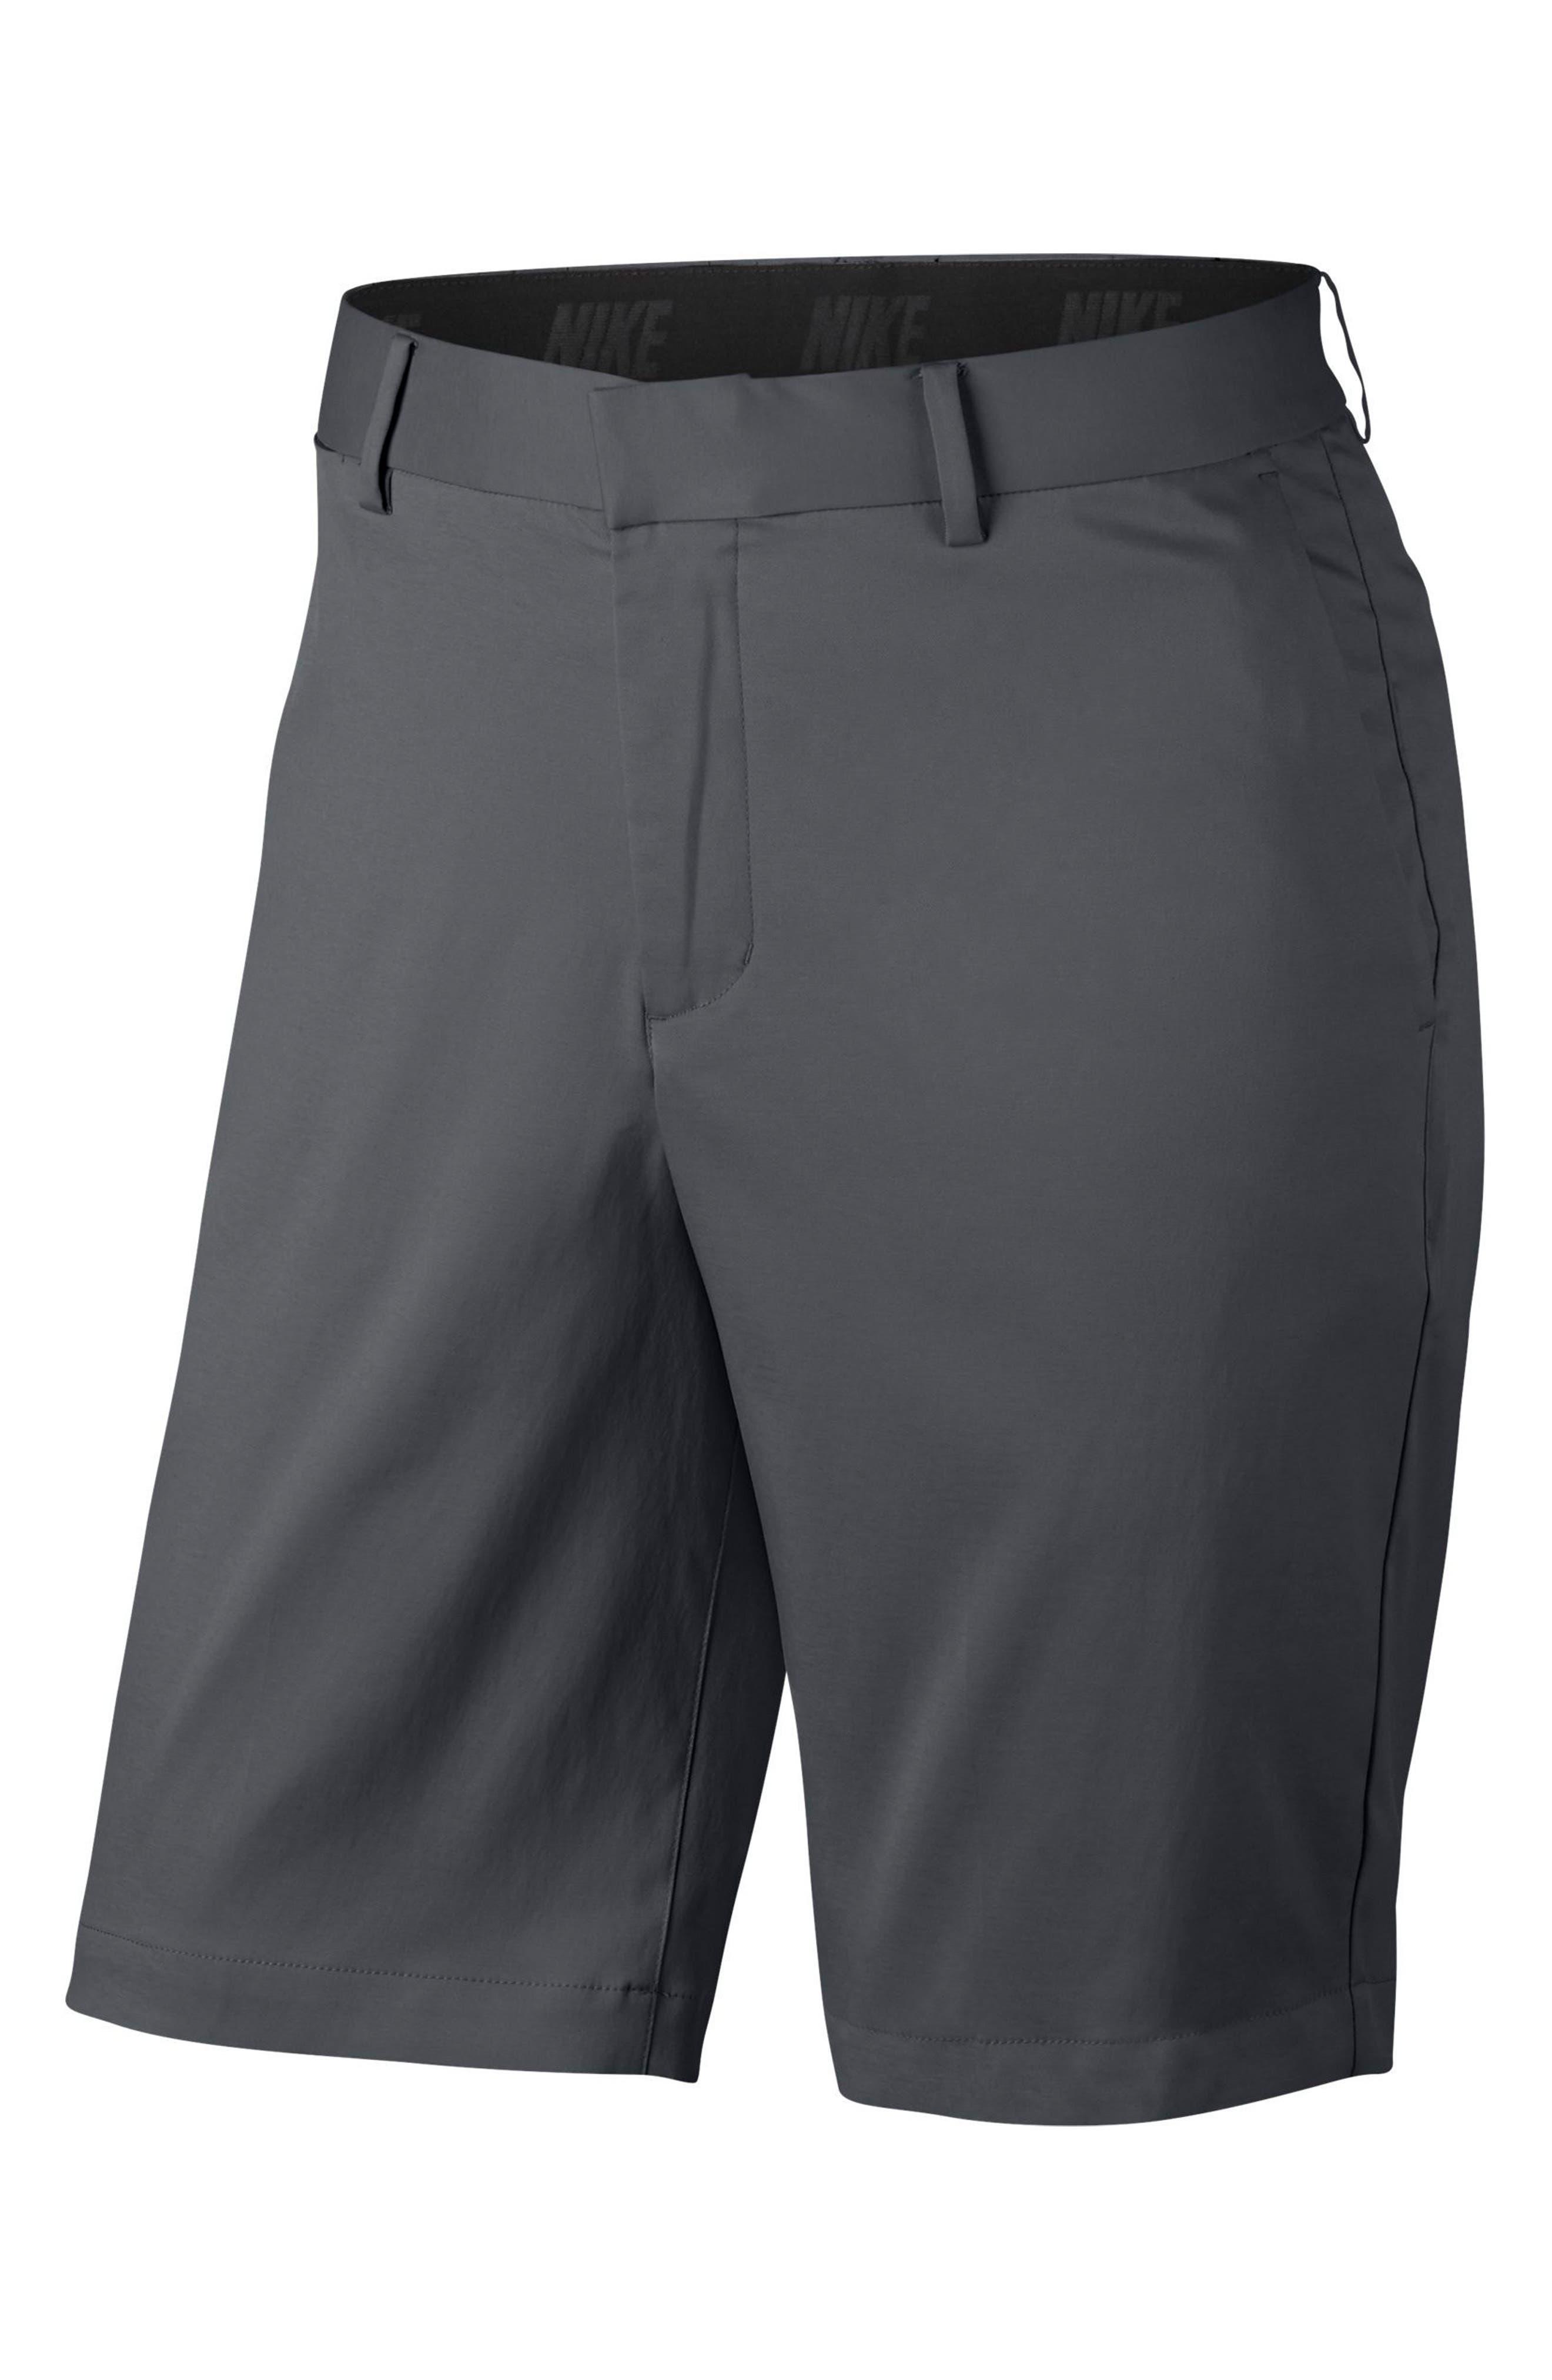 Flat Front Golf Shorts,                             Alternate thumbnail 47, color,